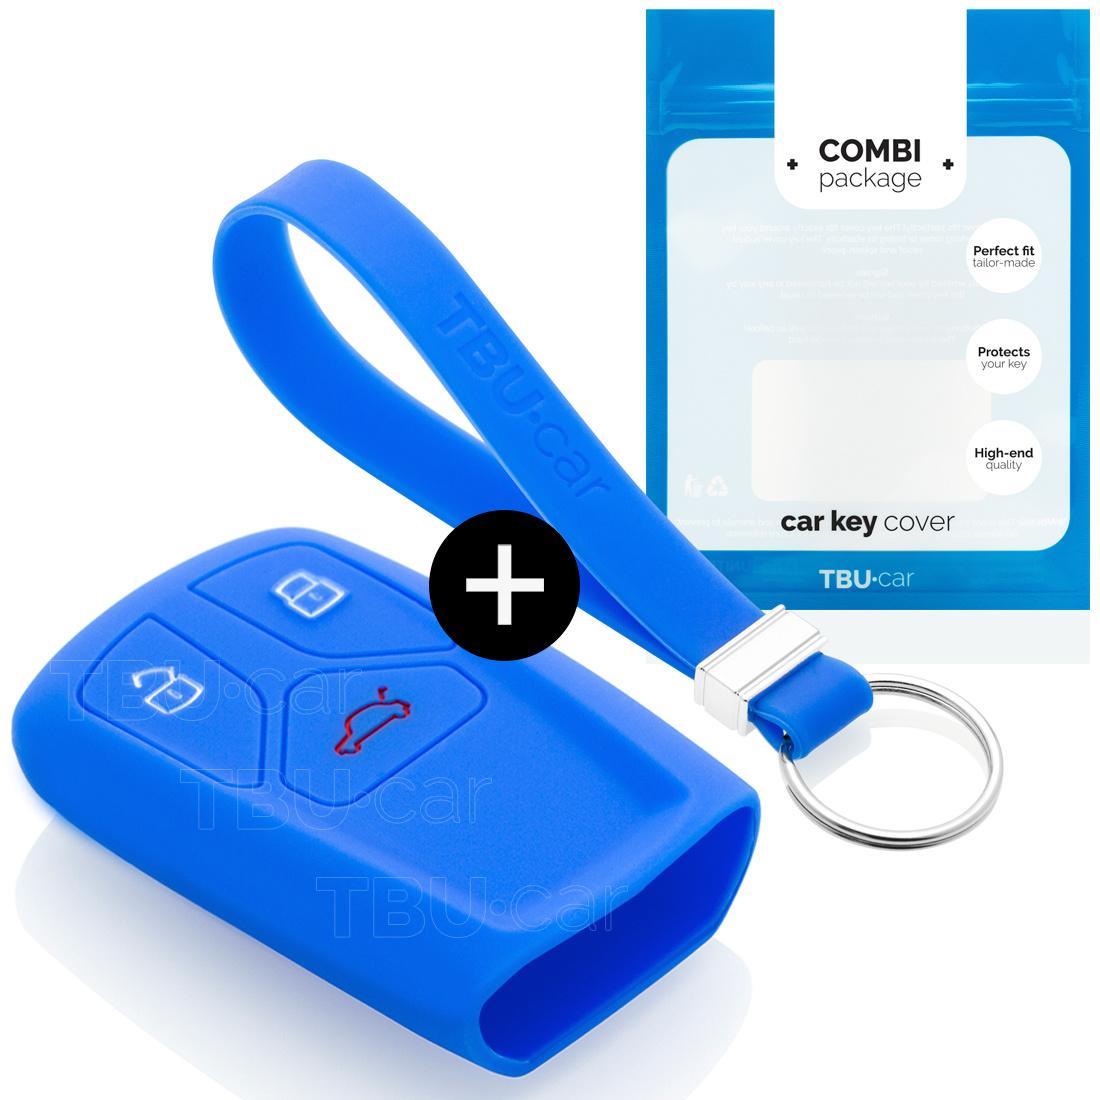 Audi Autoschlüssel Hülle - Silikon Schutzhülle - Schlüsselhülle Cover - Blau